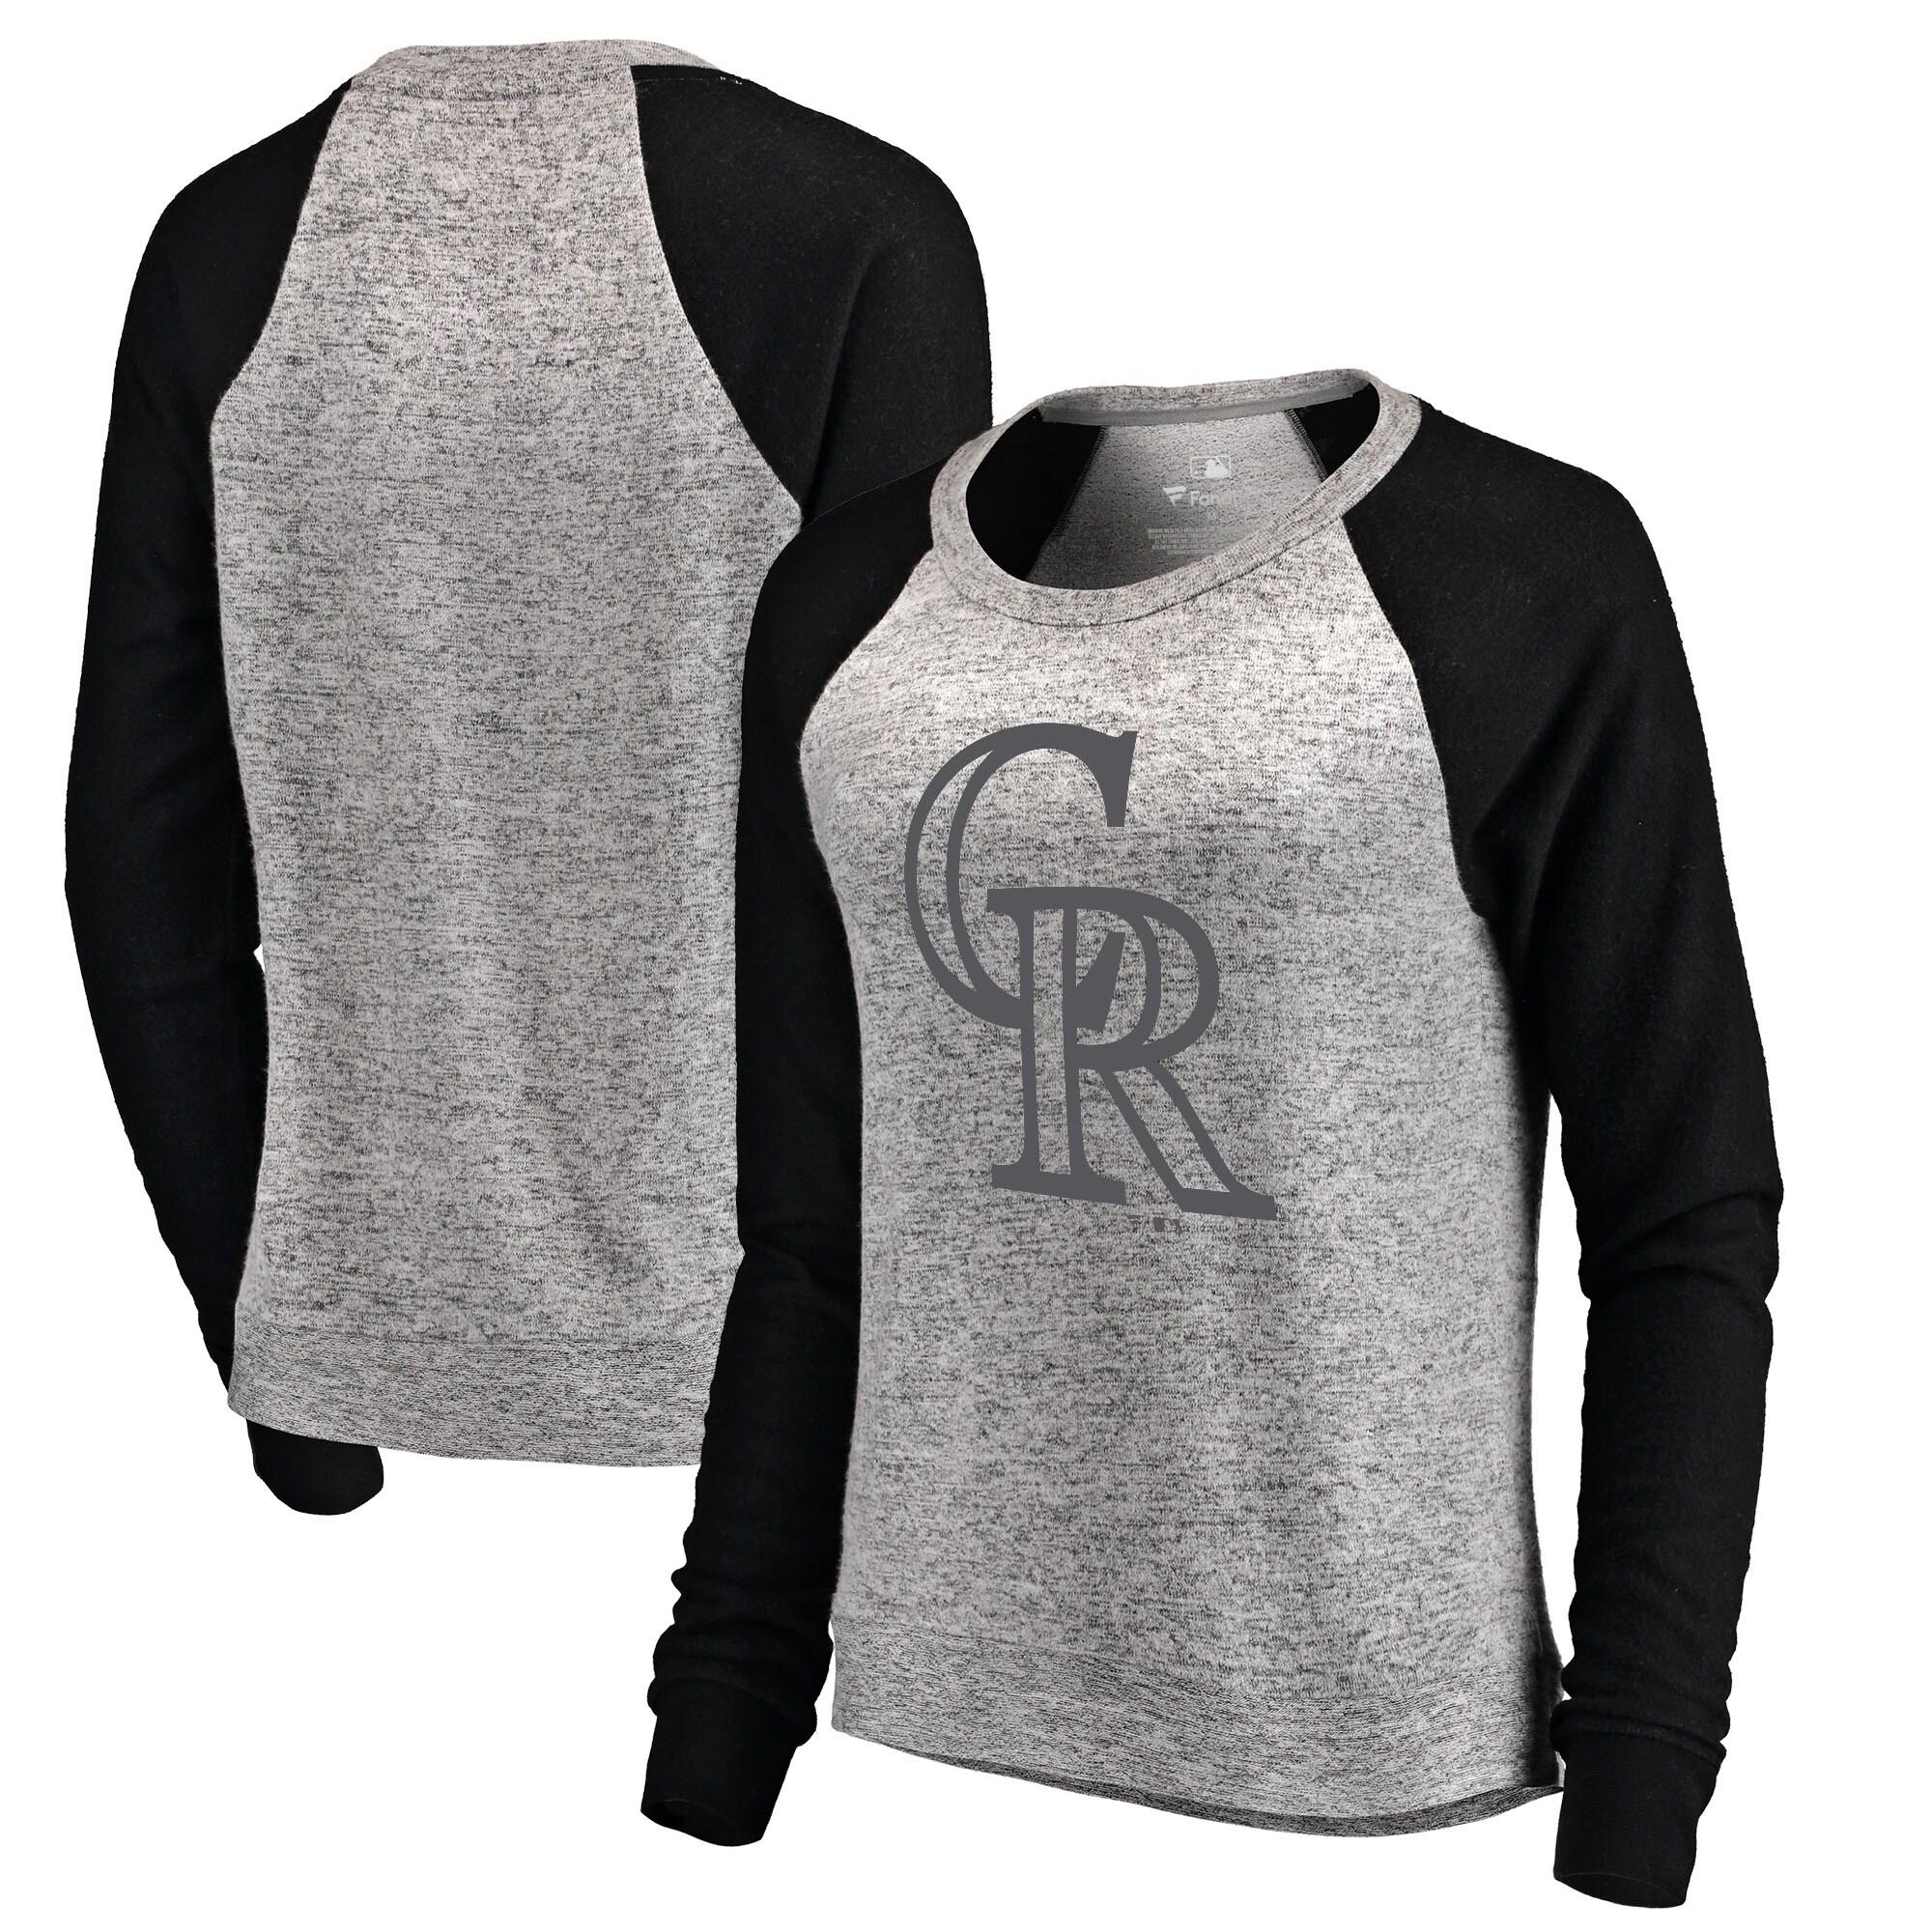 Colorado Rockies Let Loose by RNL Women's Cozy Collection Plush Raglan Tri-Blend Sweatshirt - Ash